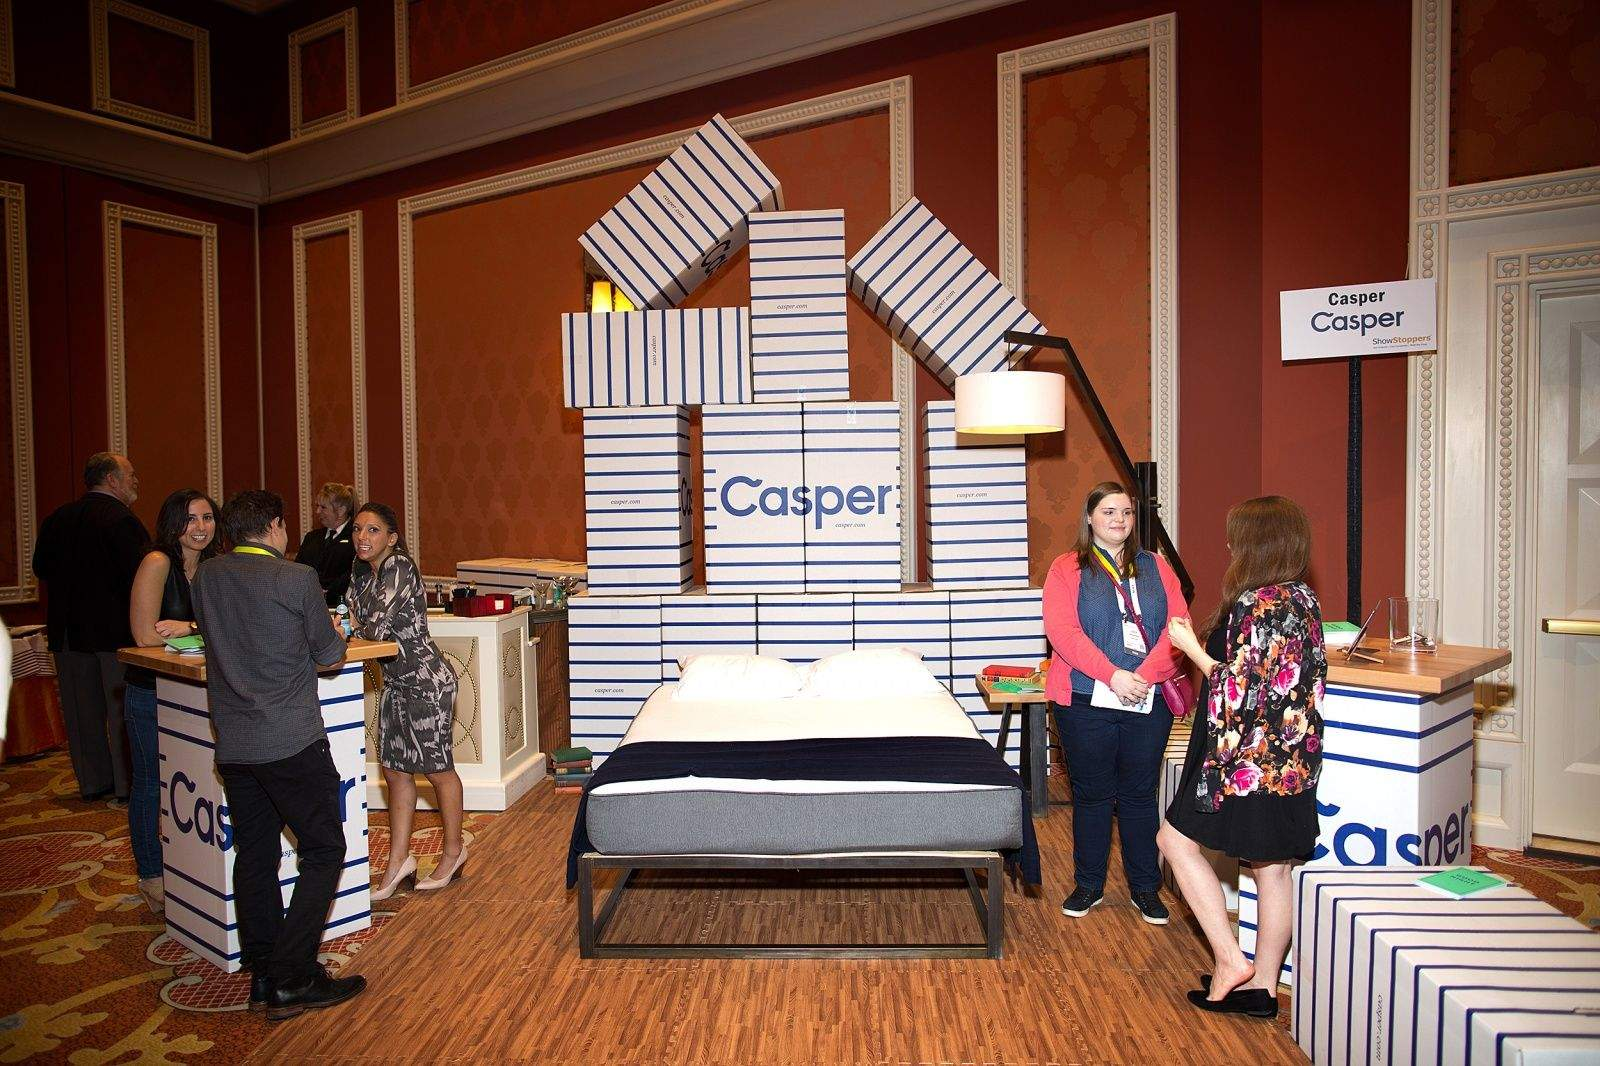 Casper Is The Friendly Mattress That Arrives In A Box